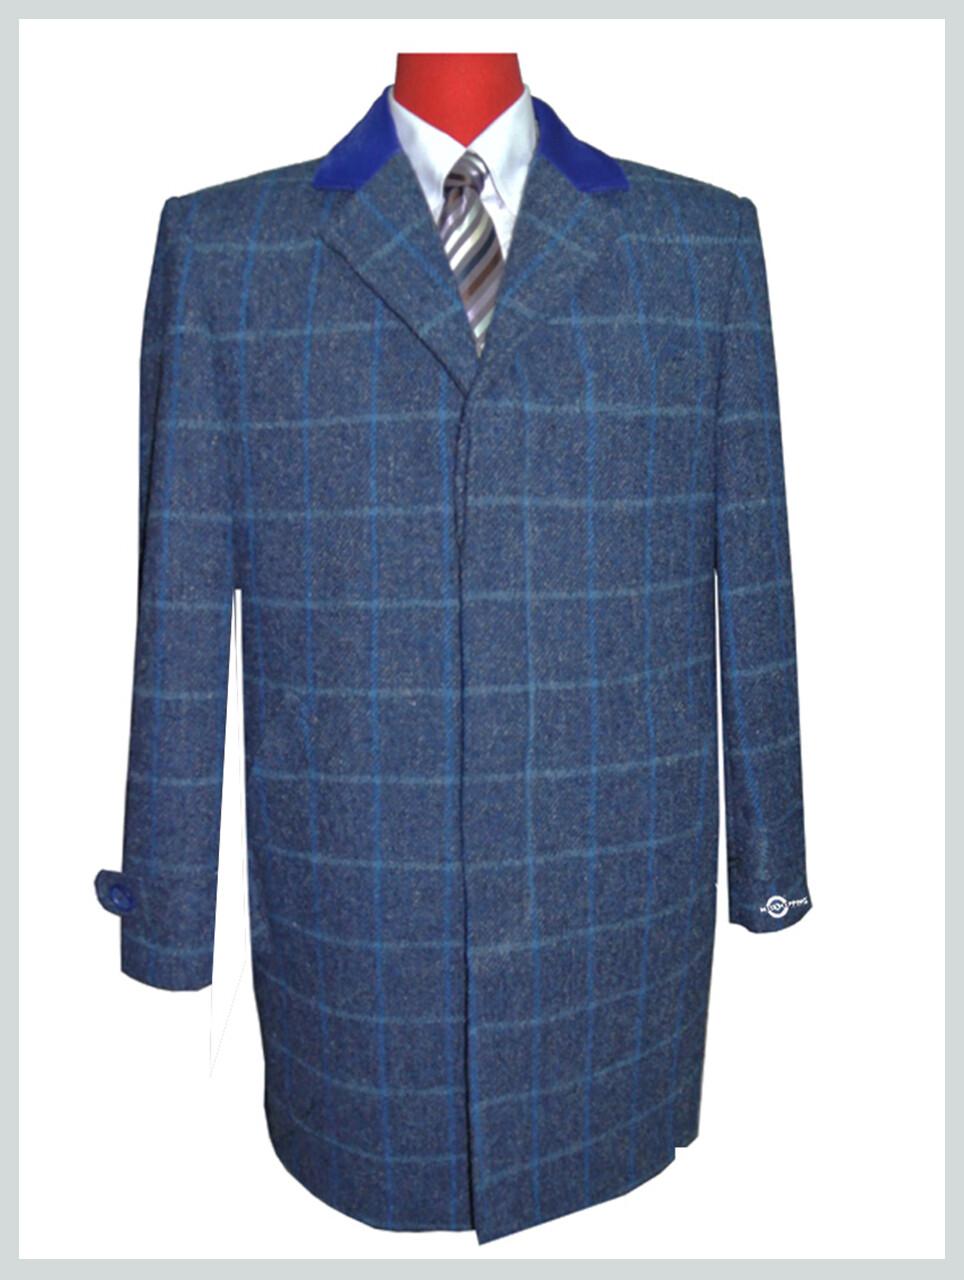 Overcoat| Vintage Blue Long Wool Coat For Men